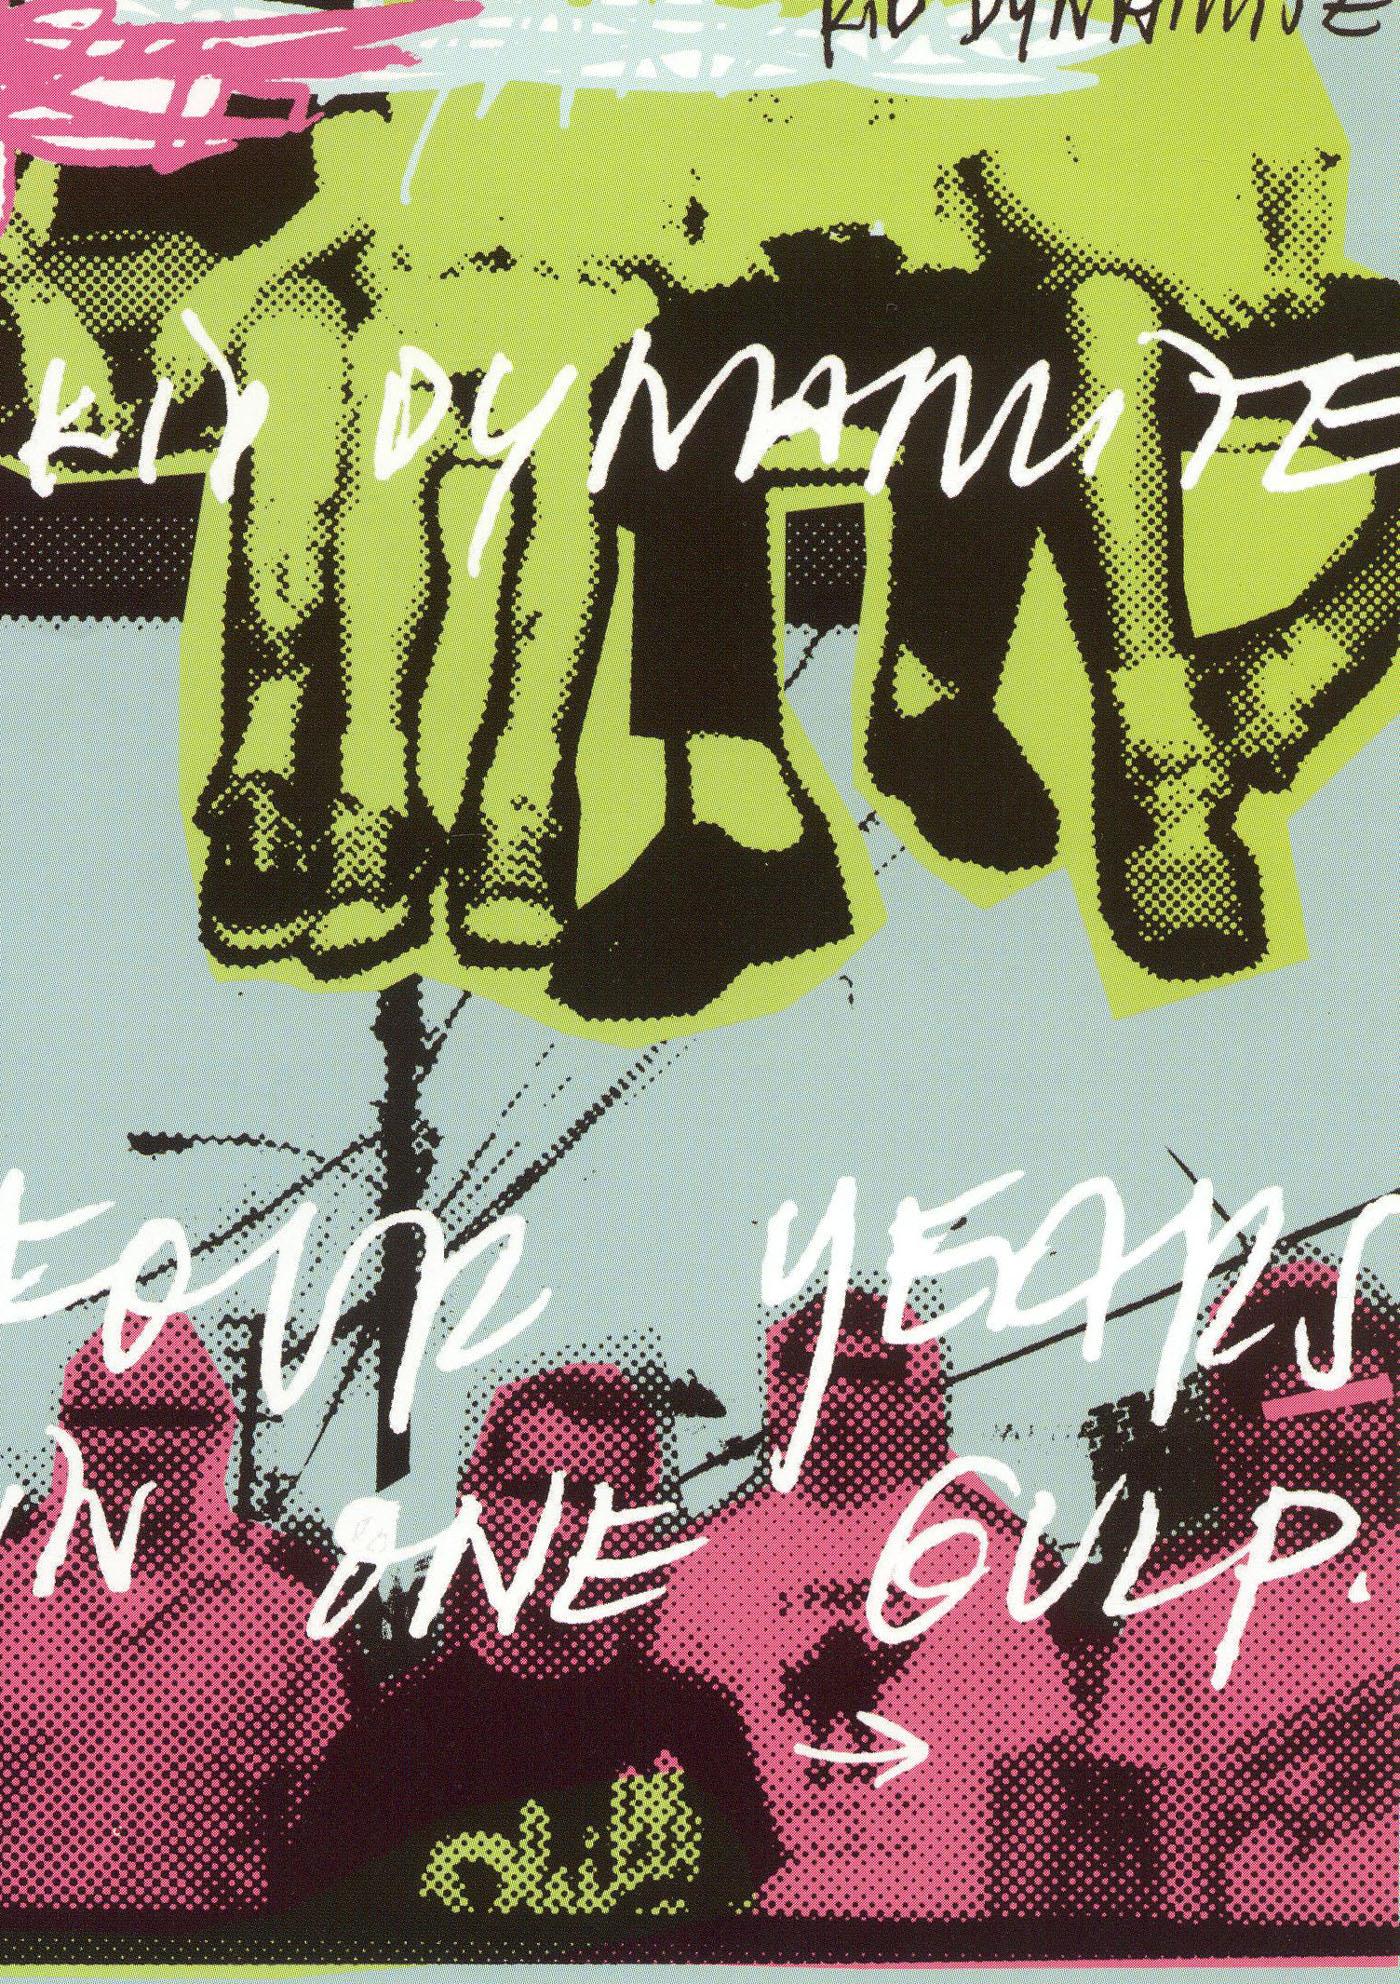 Kid Dynamite: Four Years in One Gulp